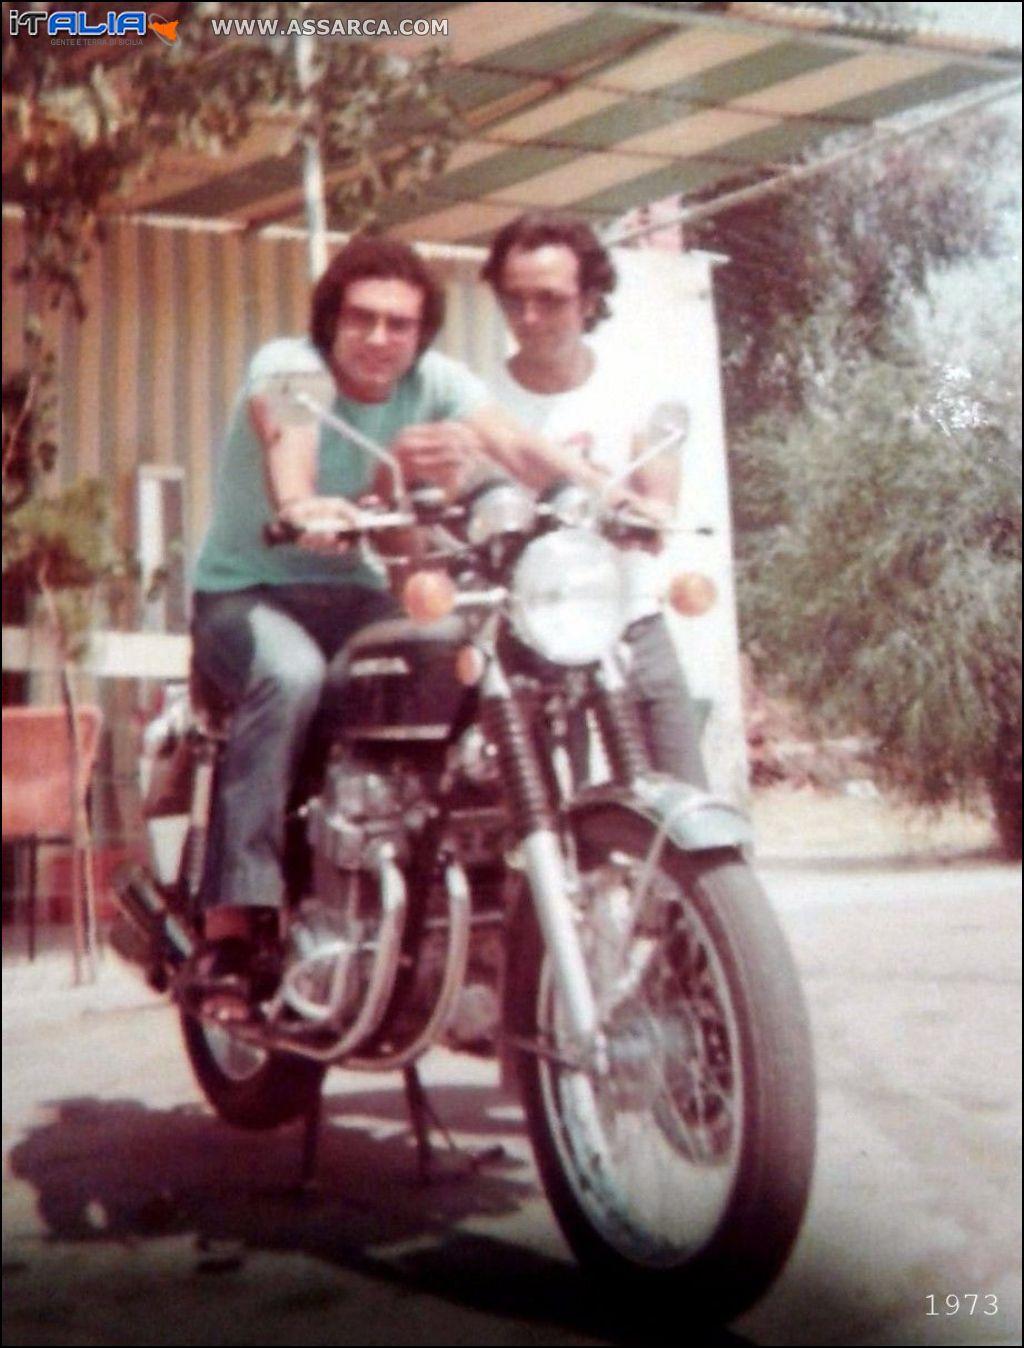 ��Alia 1973 - Giovanni Giustiniani ed Enzo Leone